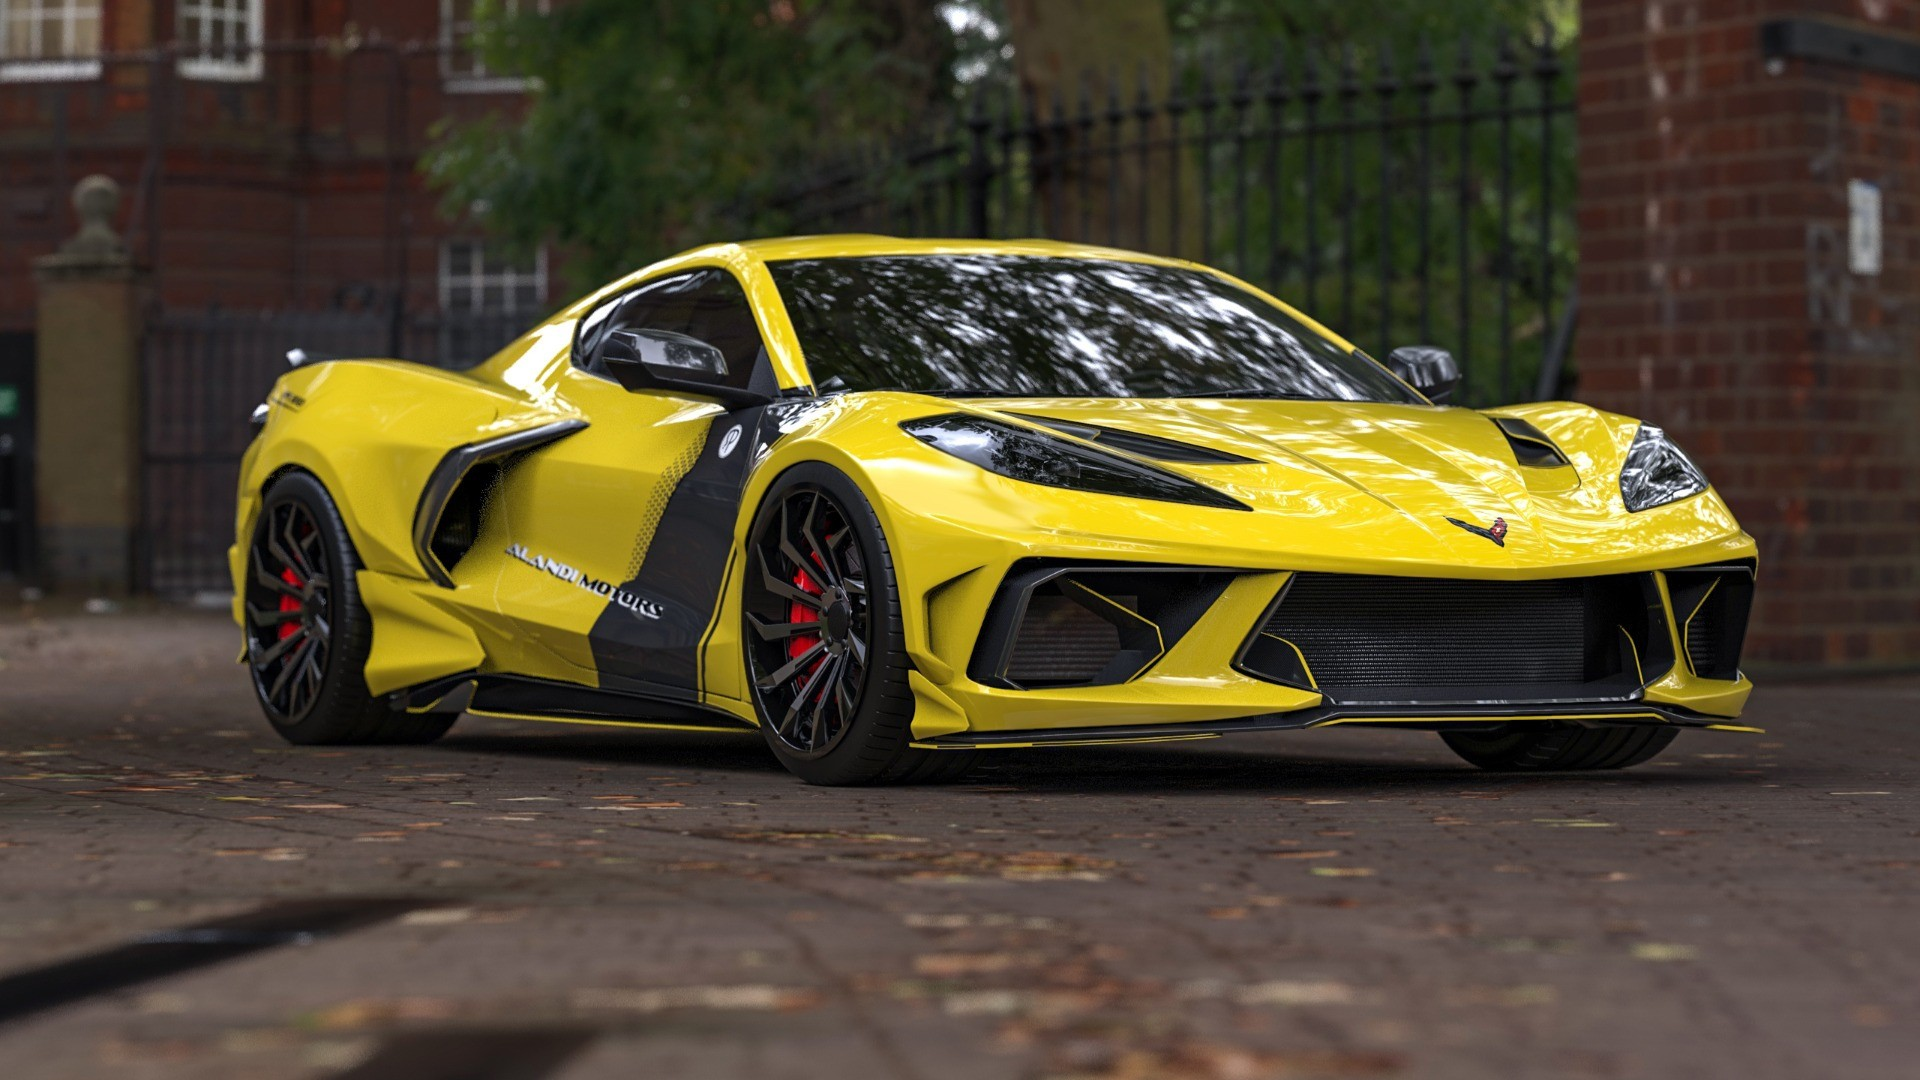 Chevrolet-Corvette-Centurion-by-Alandi-Motors-9